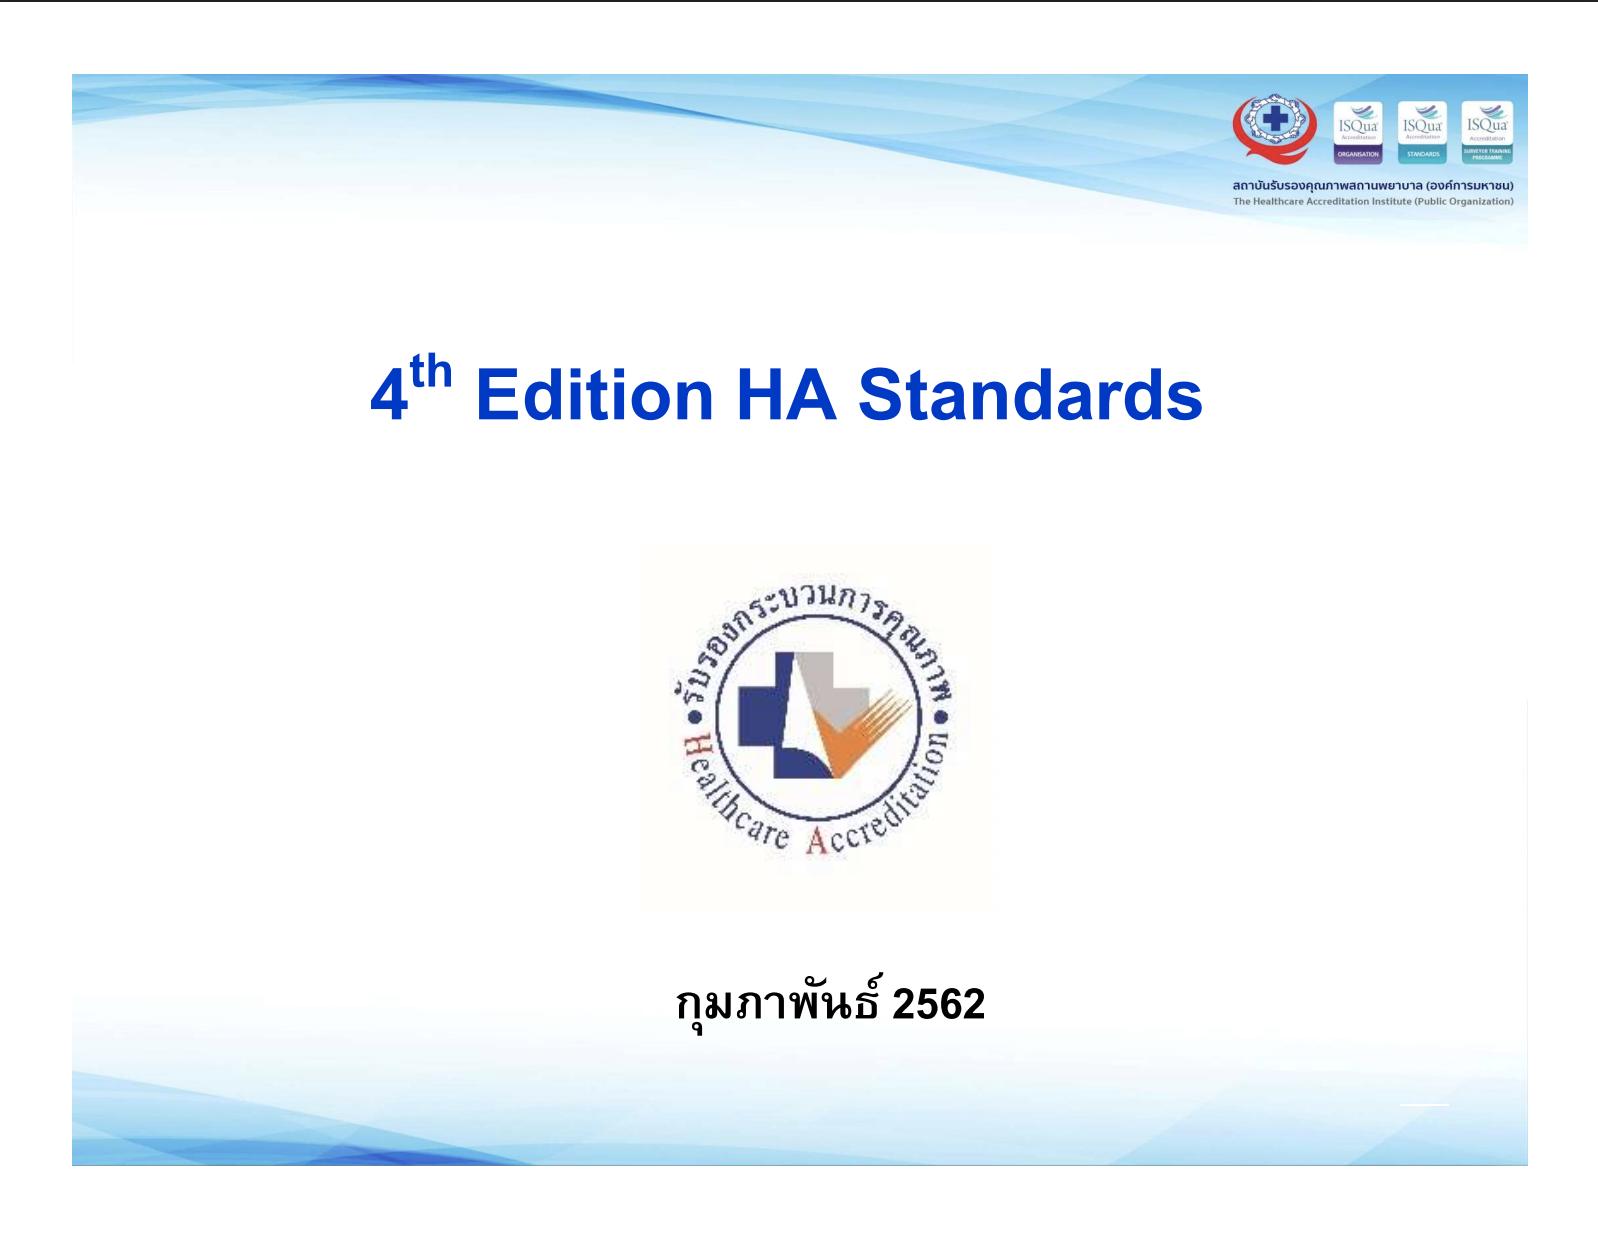 4th Edition HA Standard